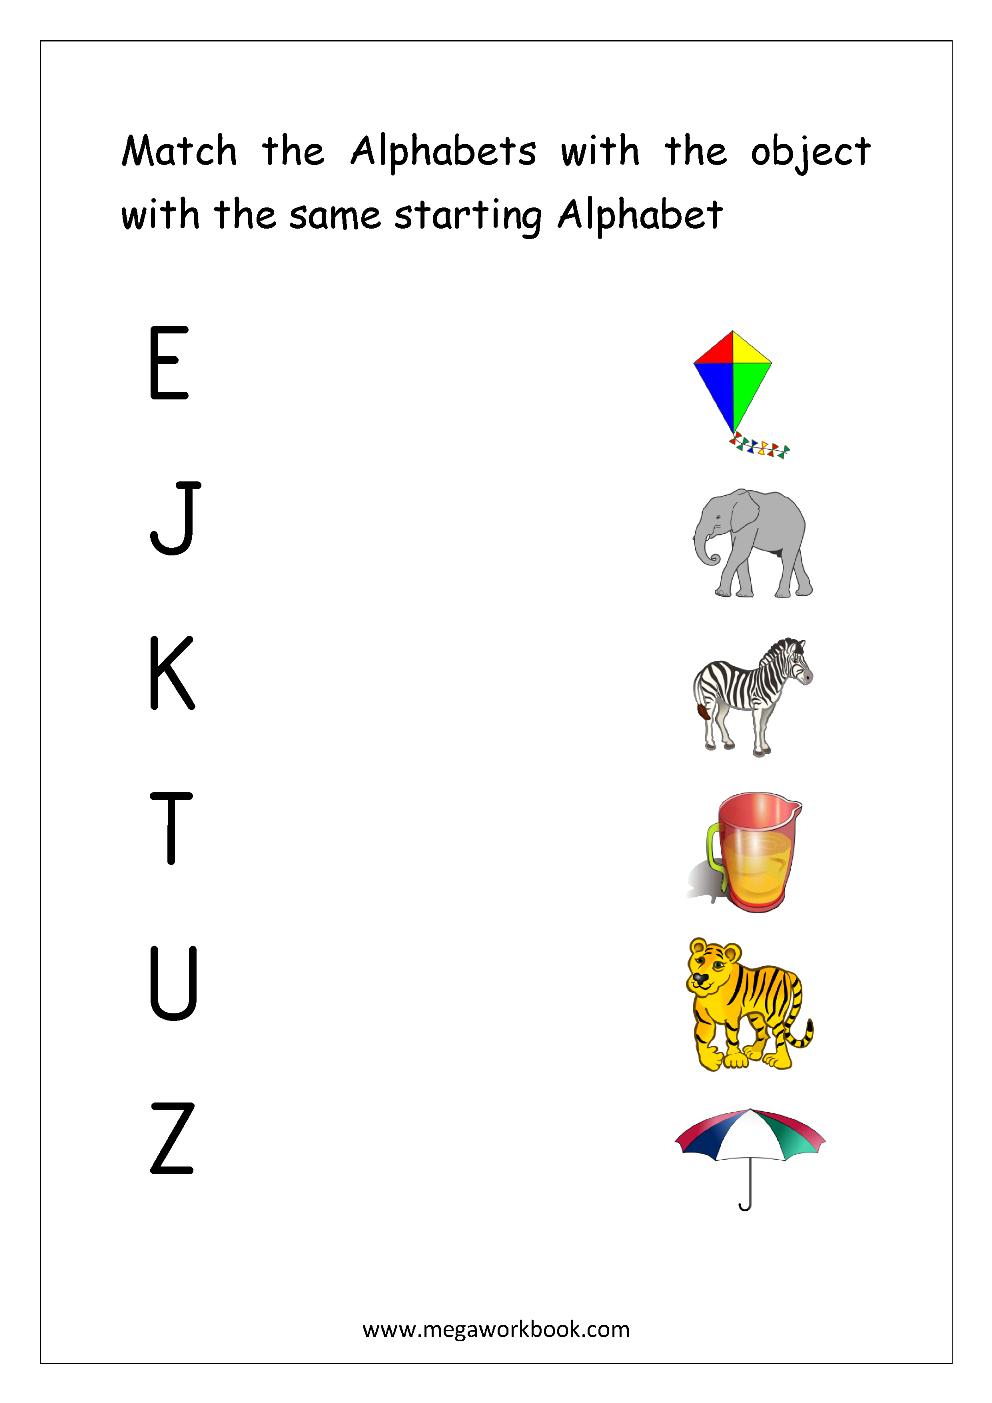 Alphabet Matching Worksheets For Kindergarten Pdf Worksheet pertaining to Alphabet Matching Worksheets For Kindergarten Pdf